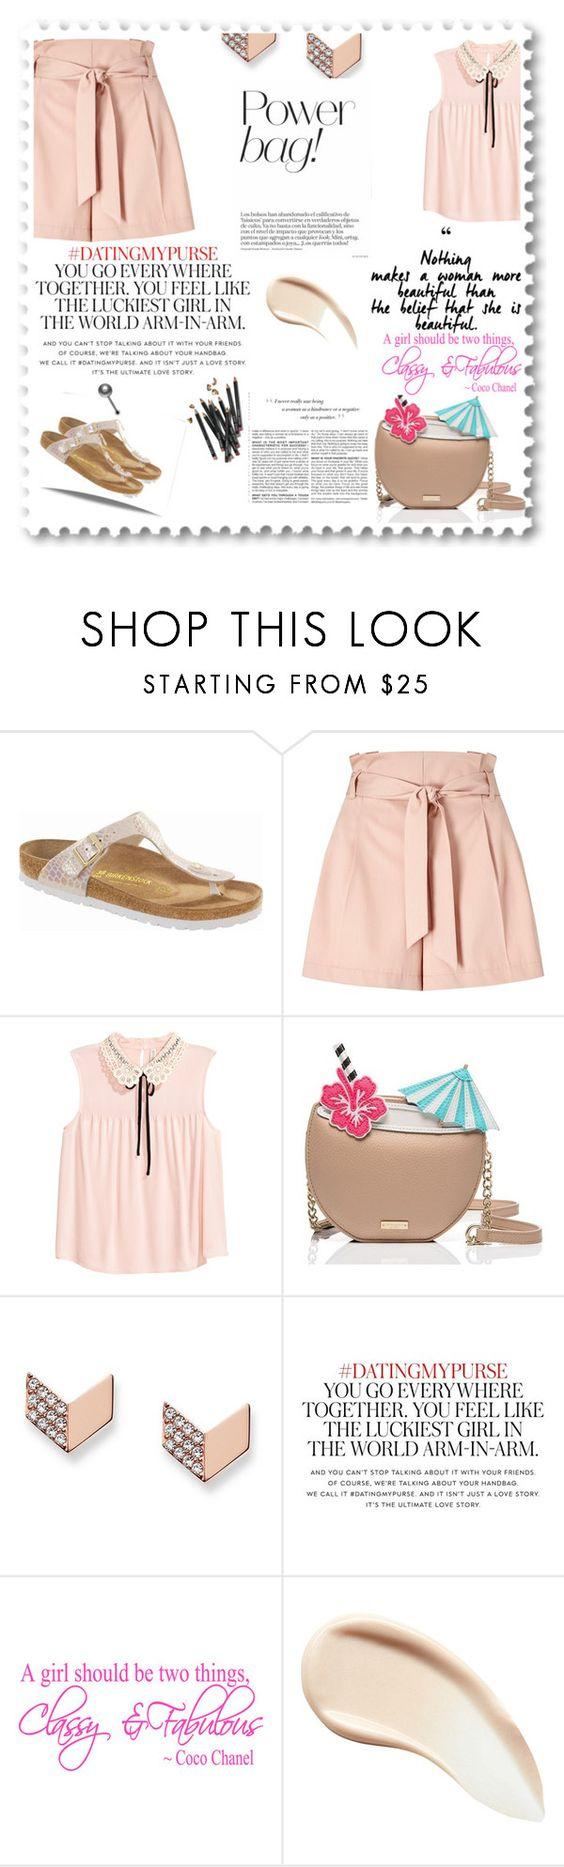 """englinsfinefootwear."" by sonila-vl ❤ liked on Polyvore featuring beauty, Birkenstock, Miss Selfridge, Kate Spade, FOSSIL, Burberry, Bobbi Brown Cosmetics, BCBGMAXAZRIA and englinsfinefootwear"